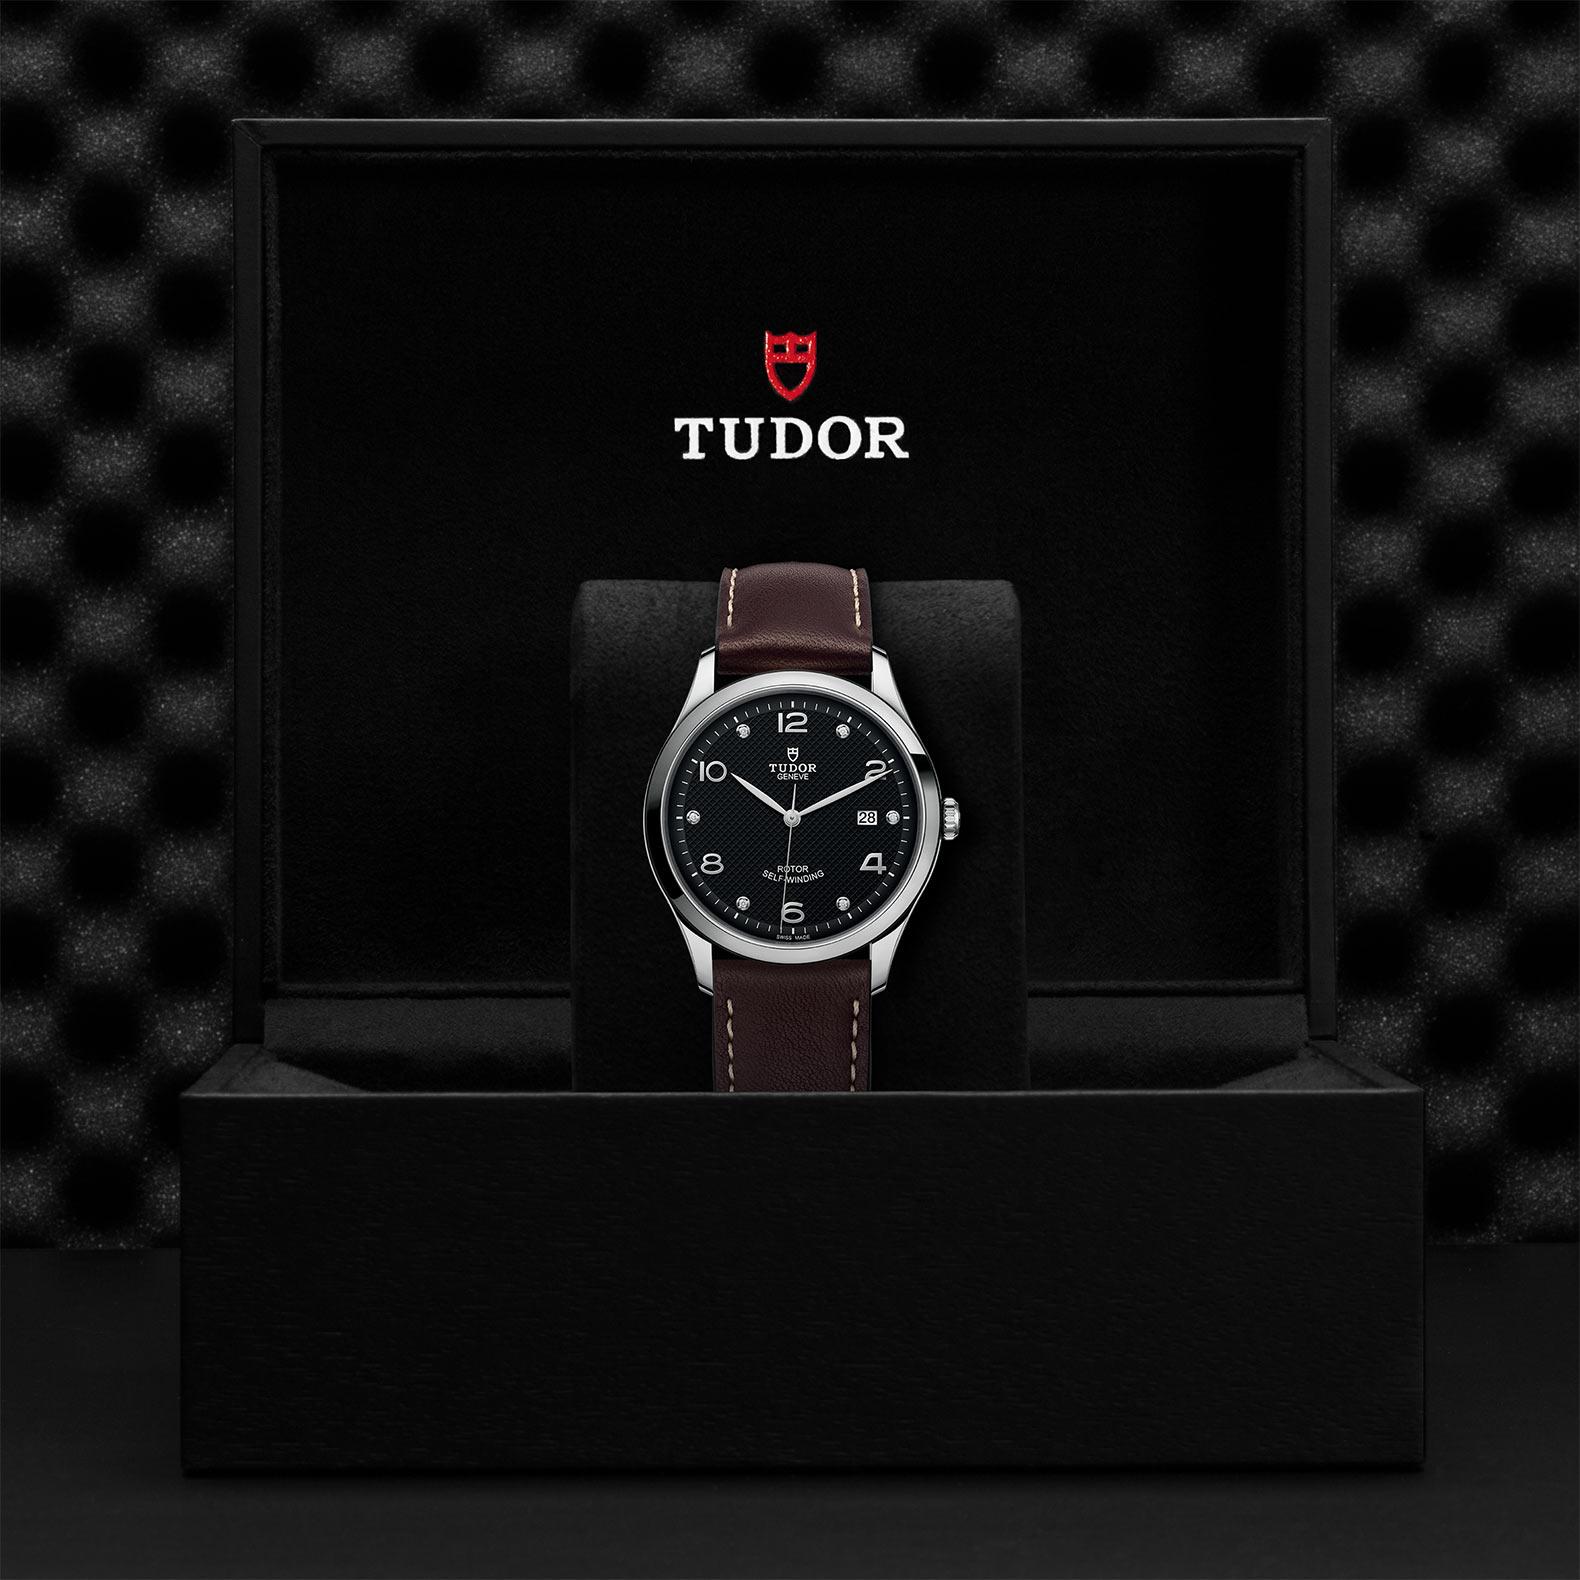 TUDOR 1926 - M91650-0009